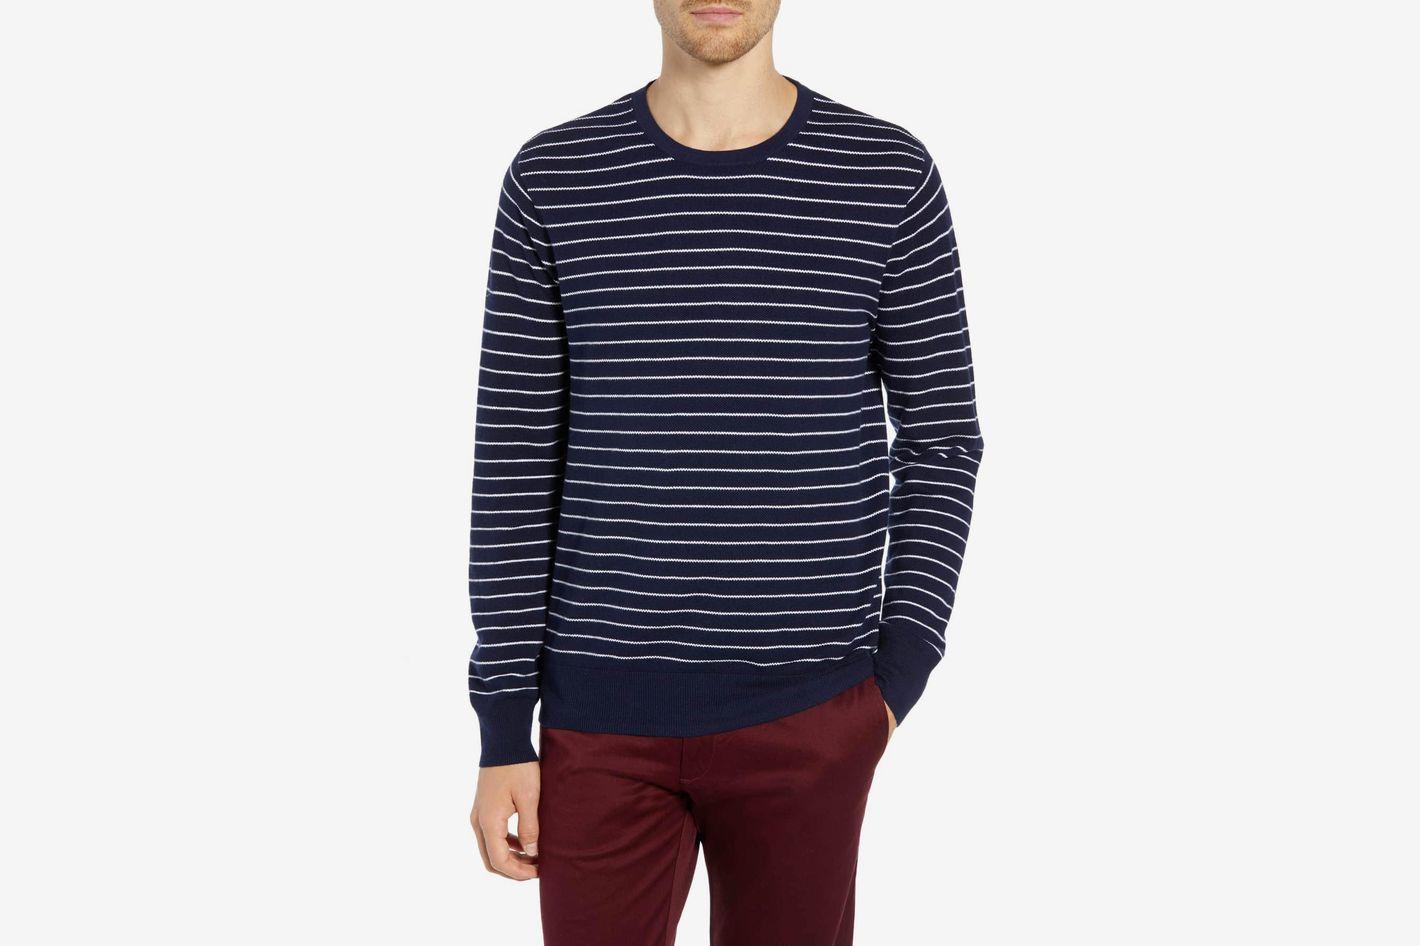 J.Crew Stripe Piqué Cotton & Cashmere Crewneck Sweater